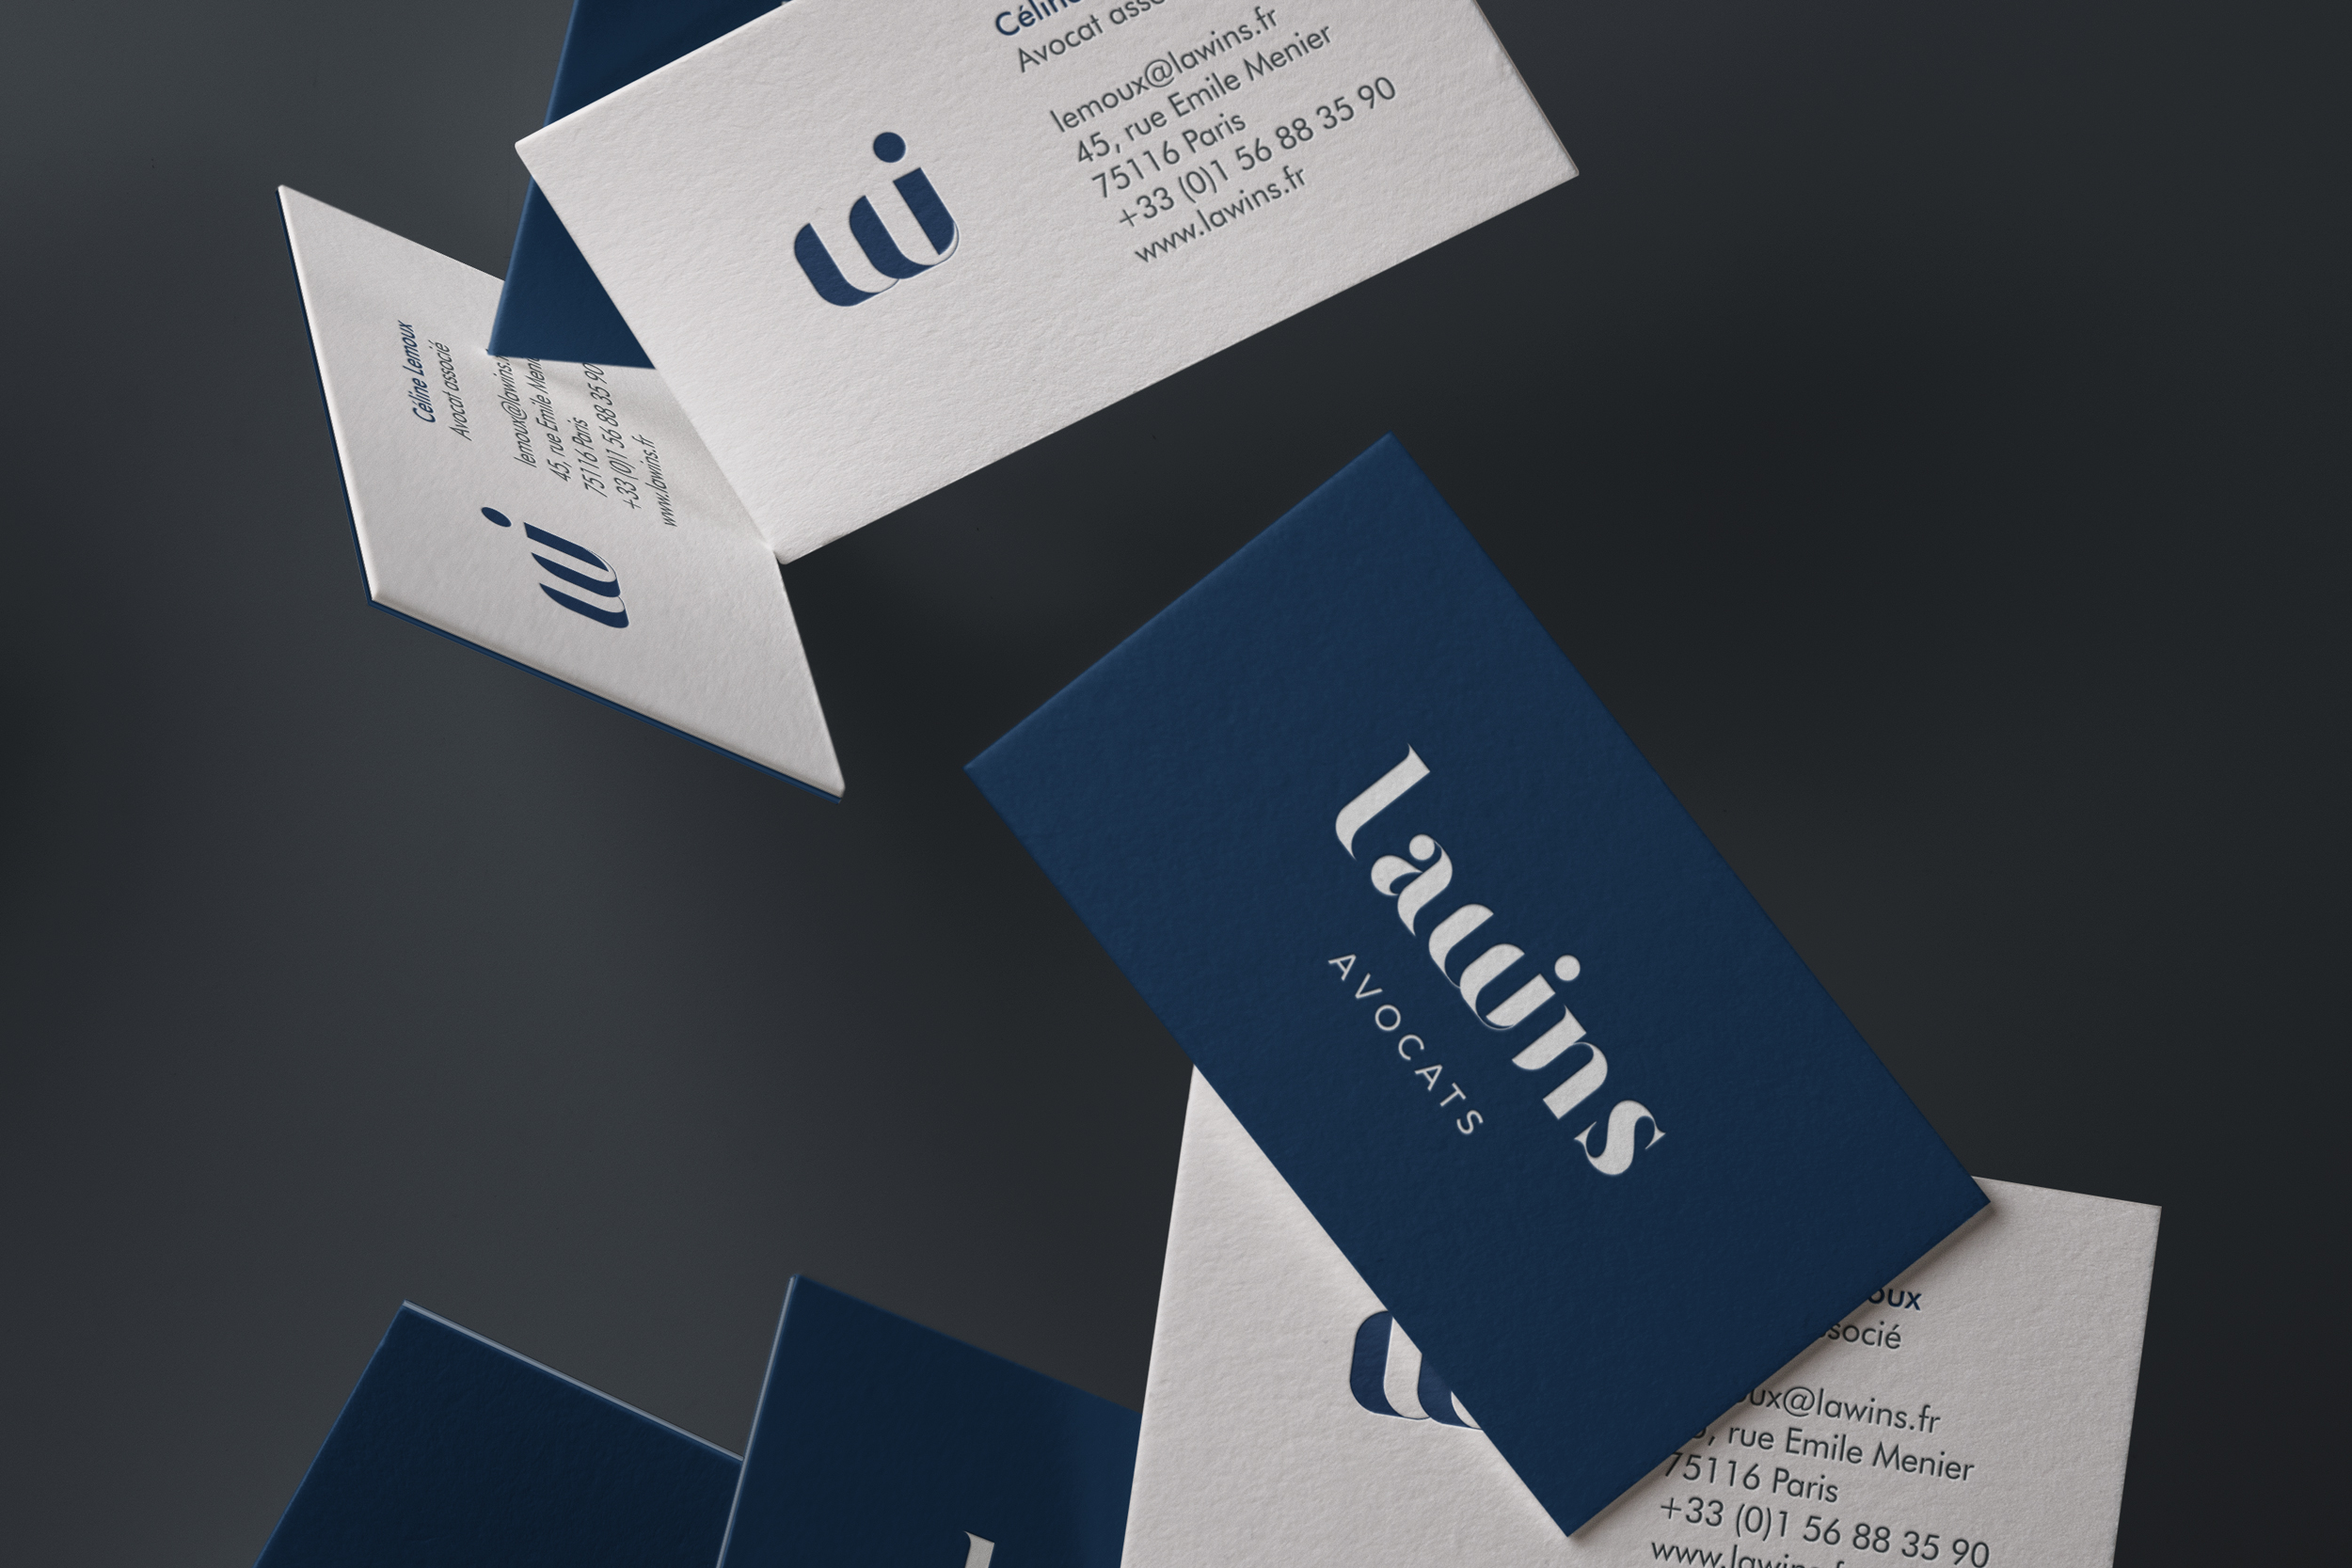 carte-visite-lawins-avocats-logo-better-stronger-paris.jpg